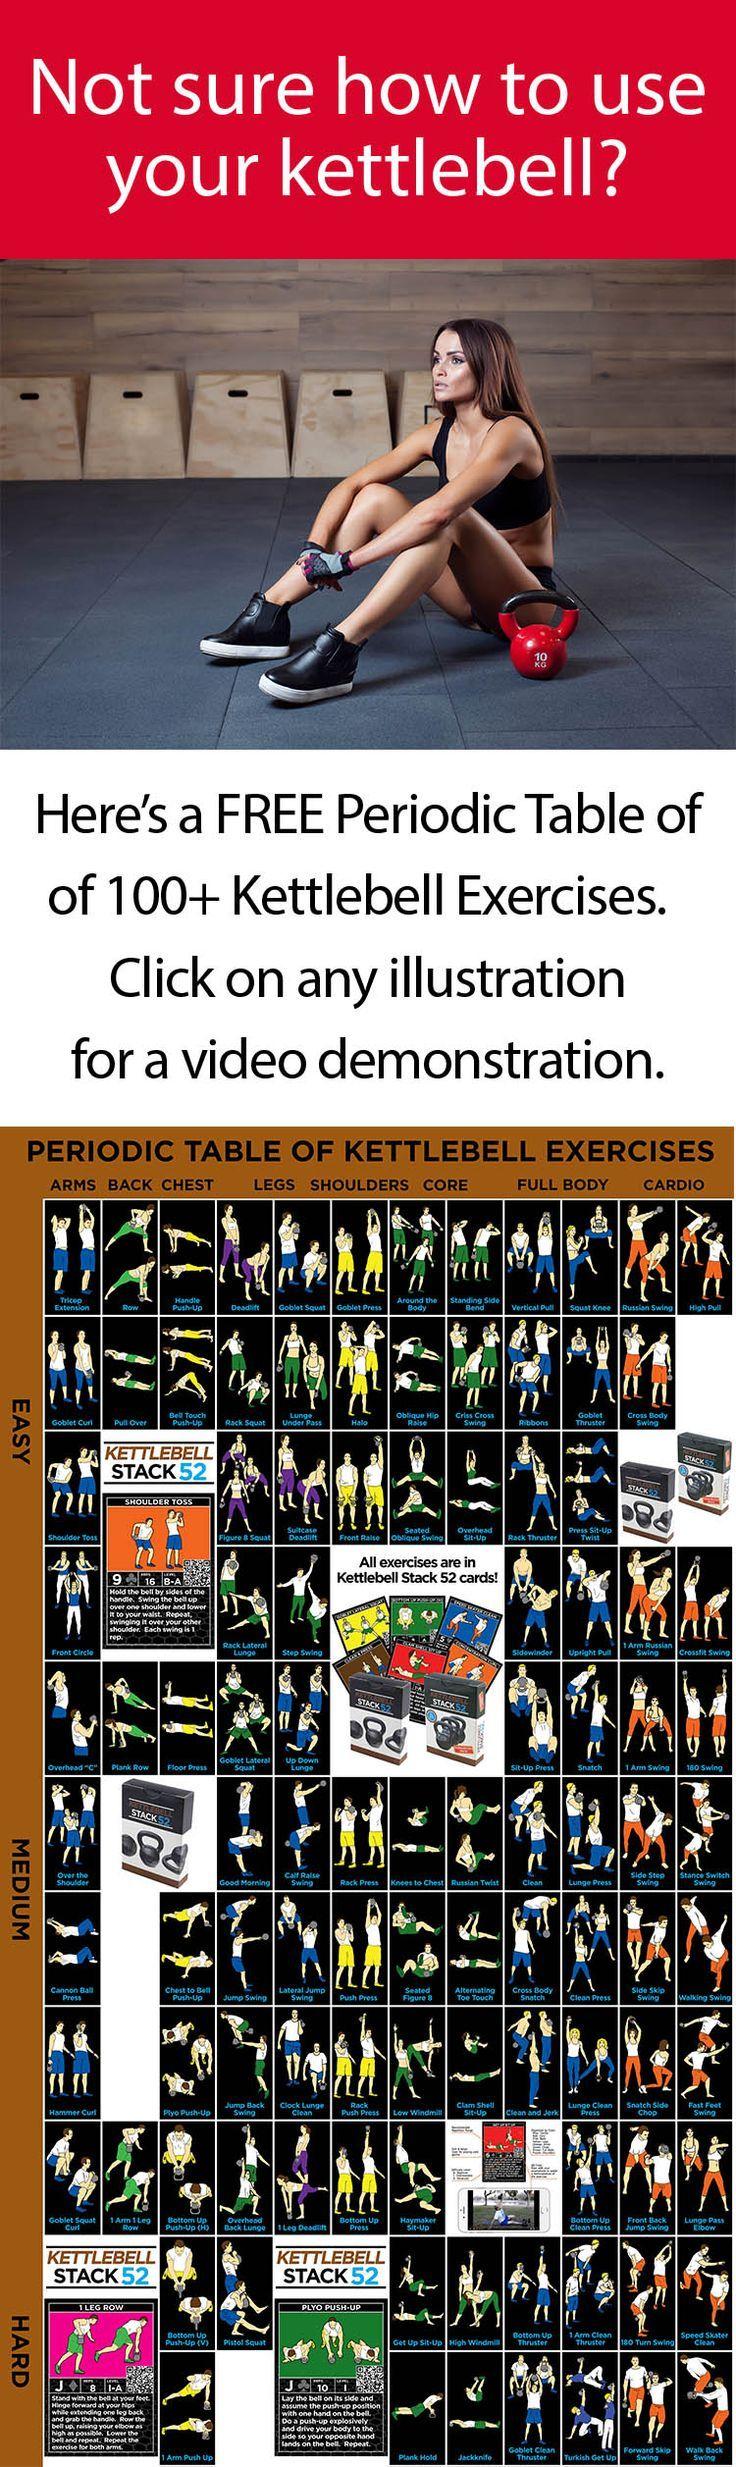 Periodic Table of Kettlebell Exercises Kettlebell